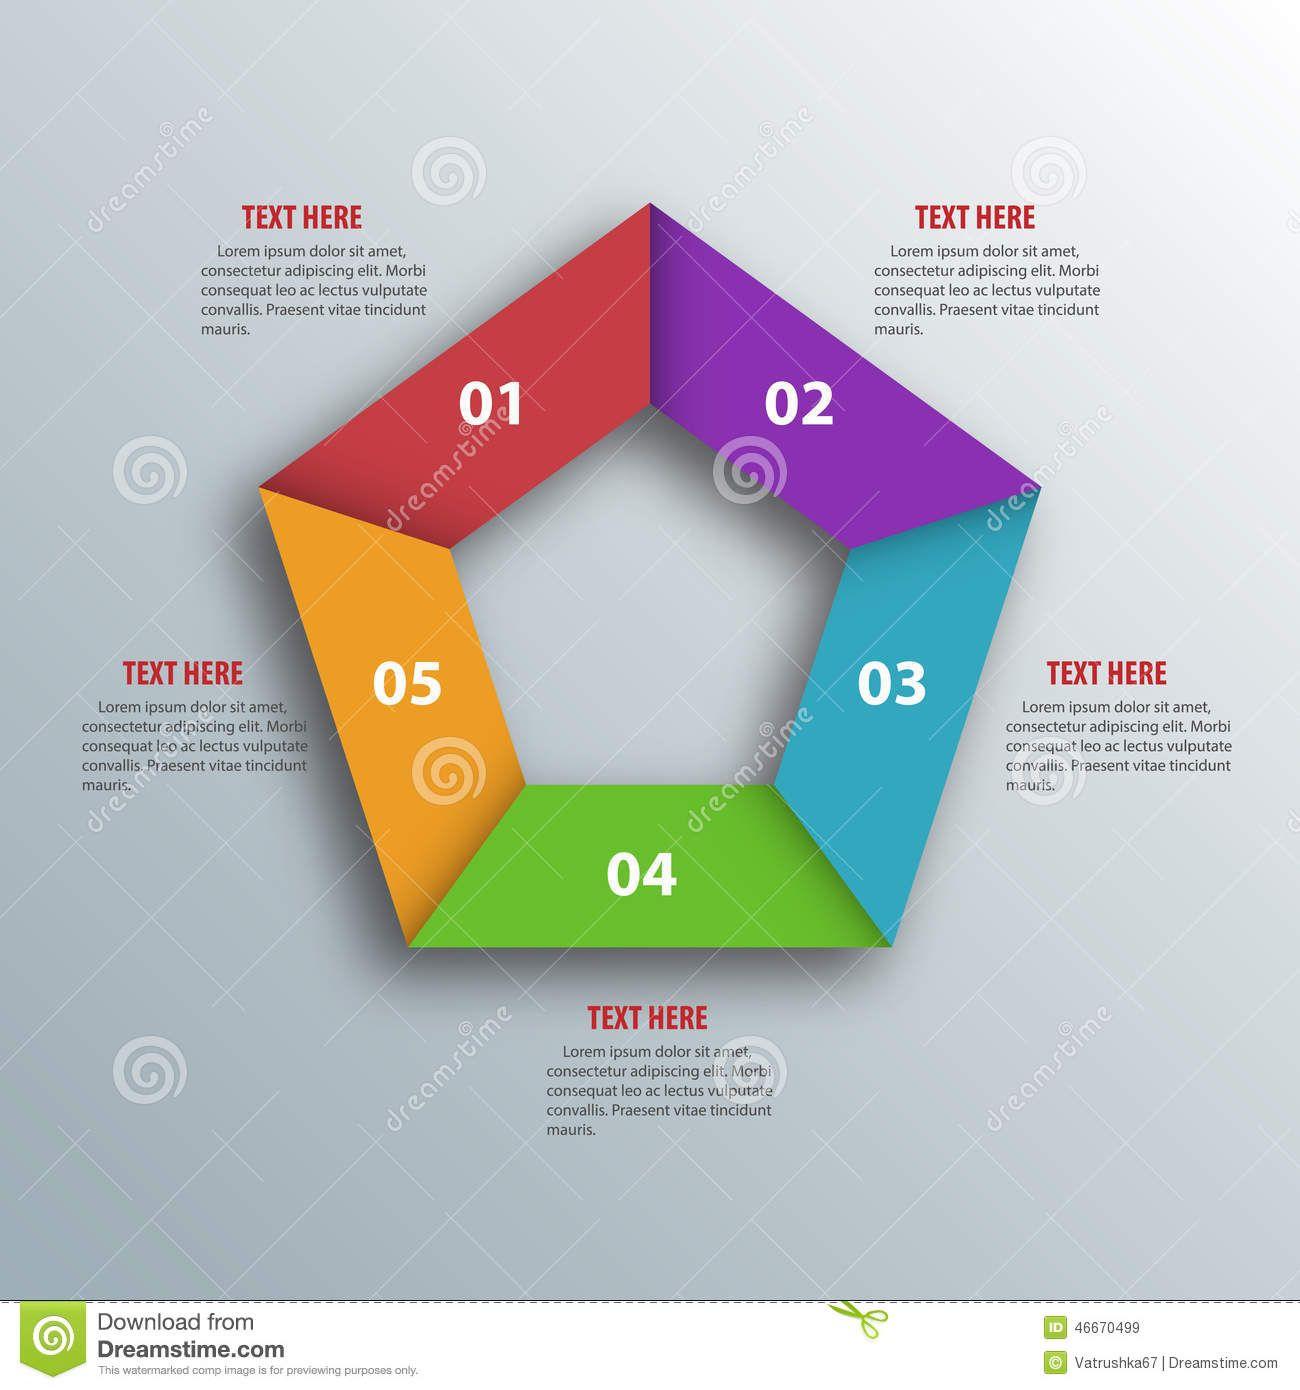 pentagon shape - Google Search | Symbology | Pinterest